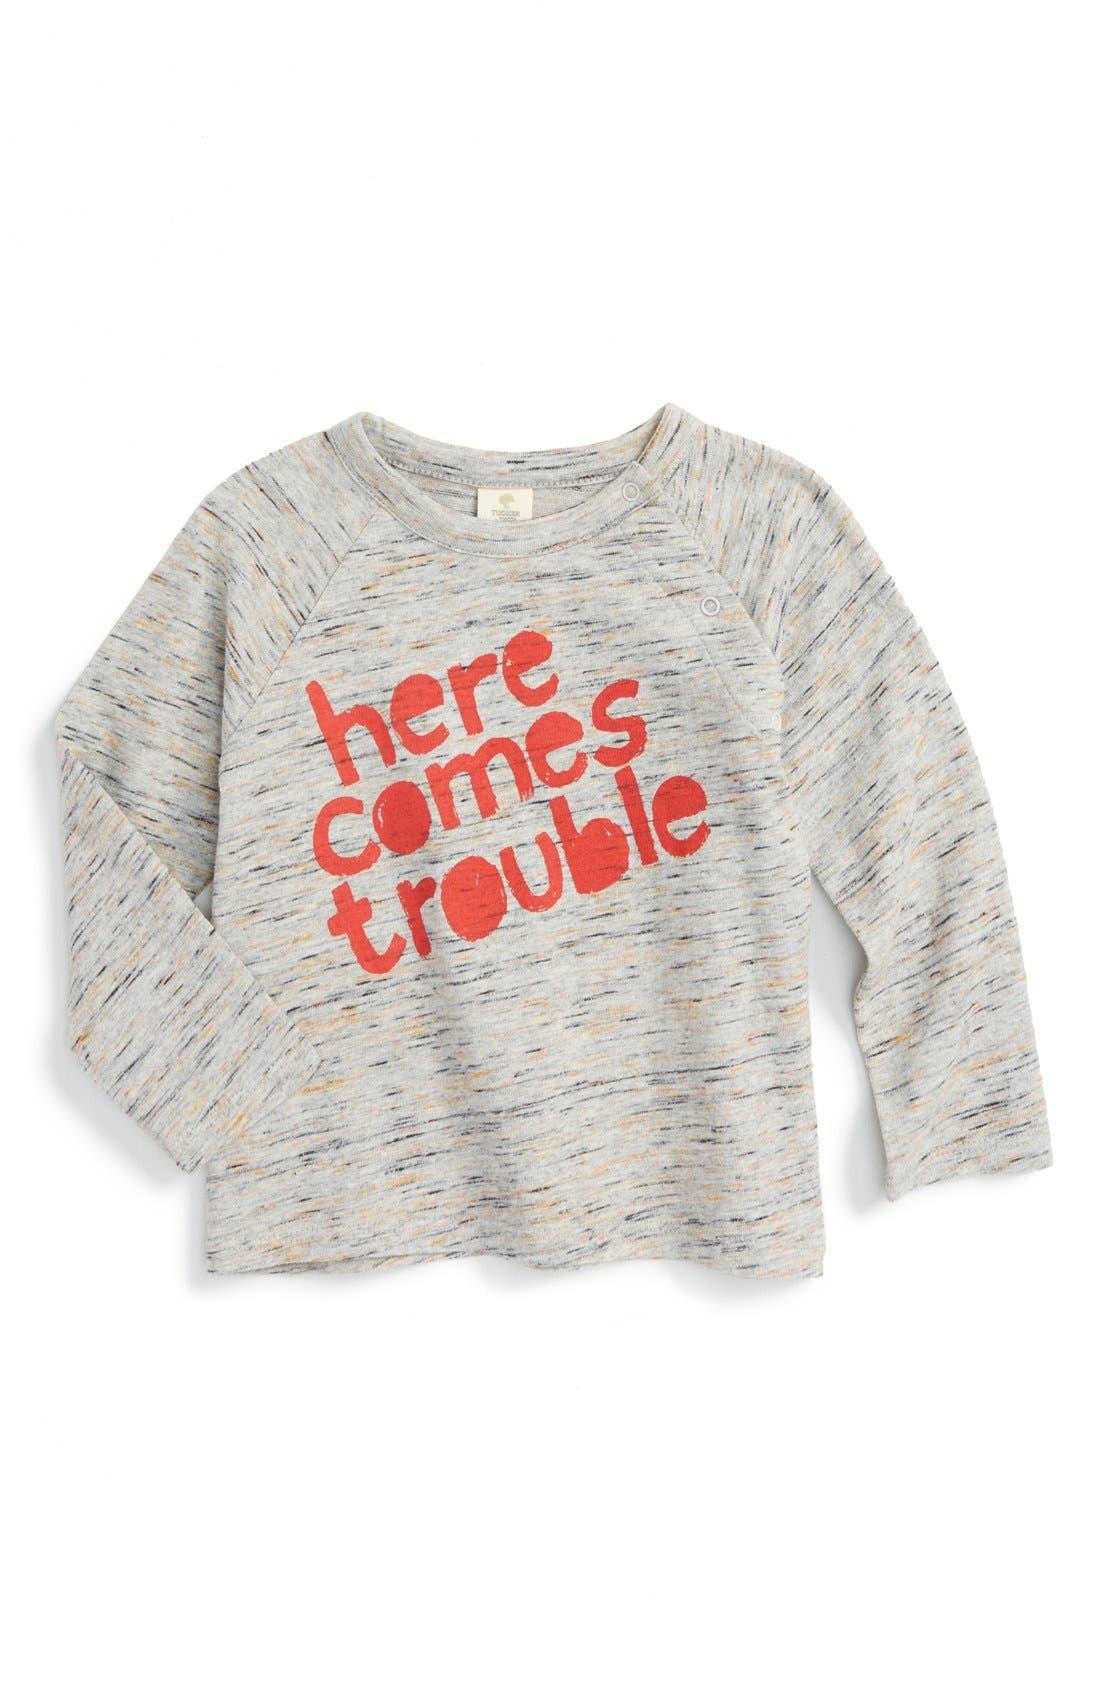 TUCKER + TATE,                             'Knock Knock' Space Dyed Long Sleeve T-Shirt,                             Main thumbnail 1, color,                             050